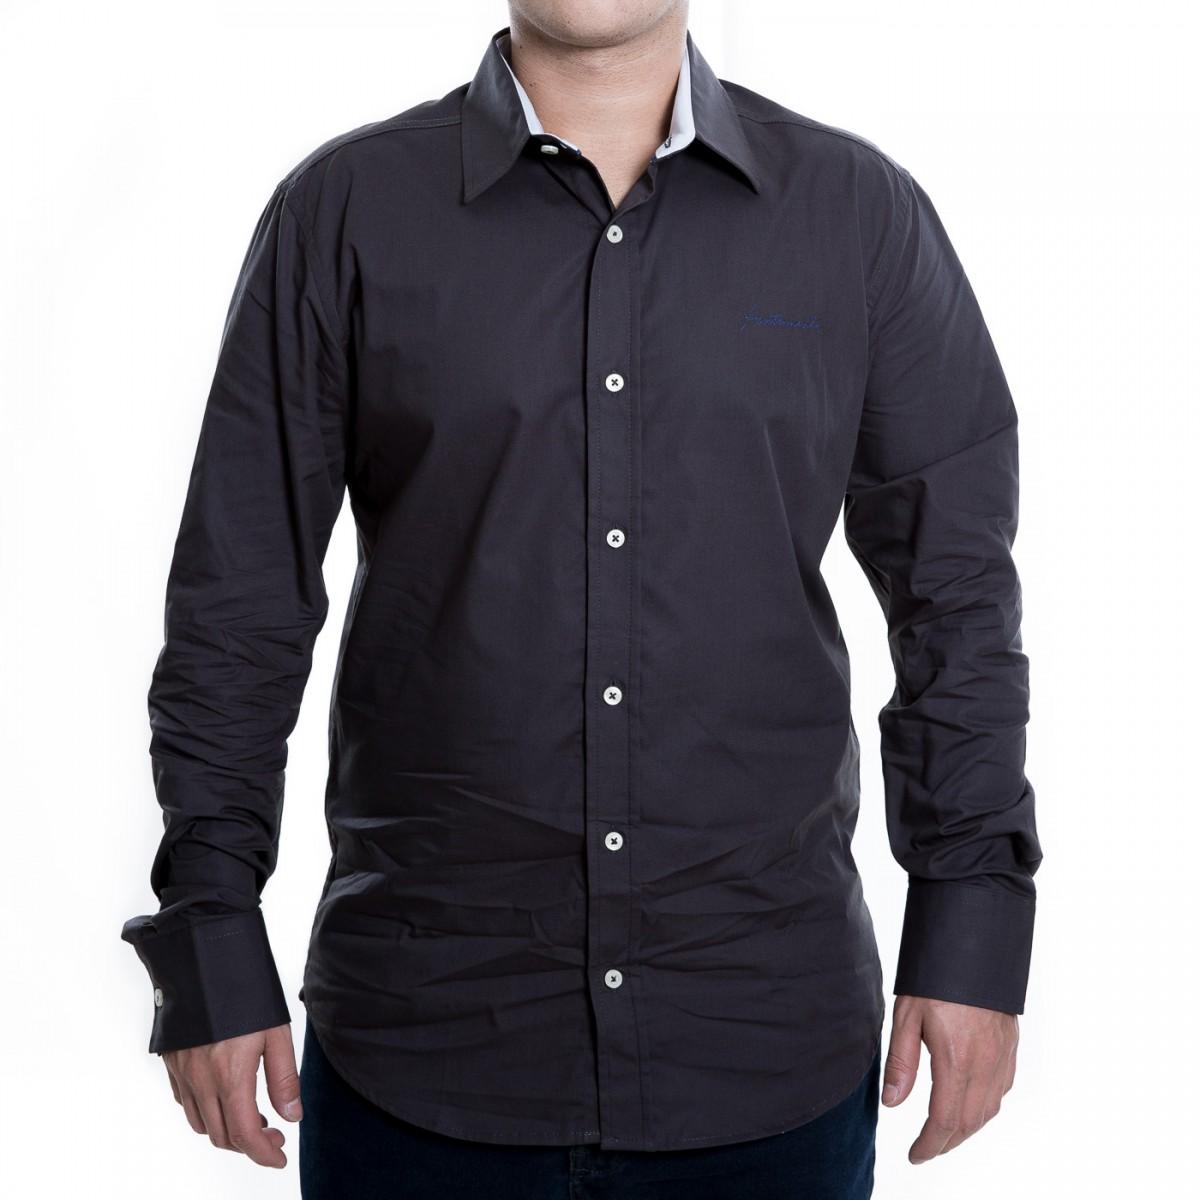 196044a0f Bizz Store - Camisa Social Masculina Acostamento Manga Longa Branco